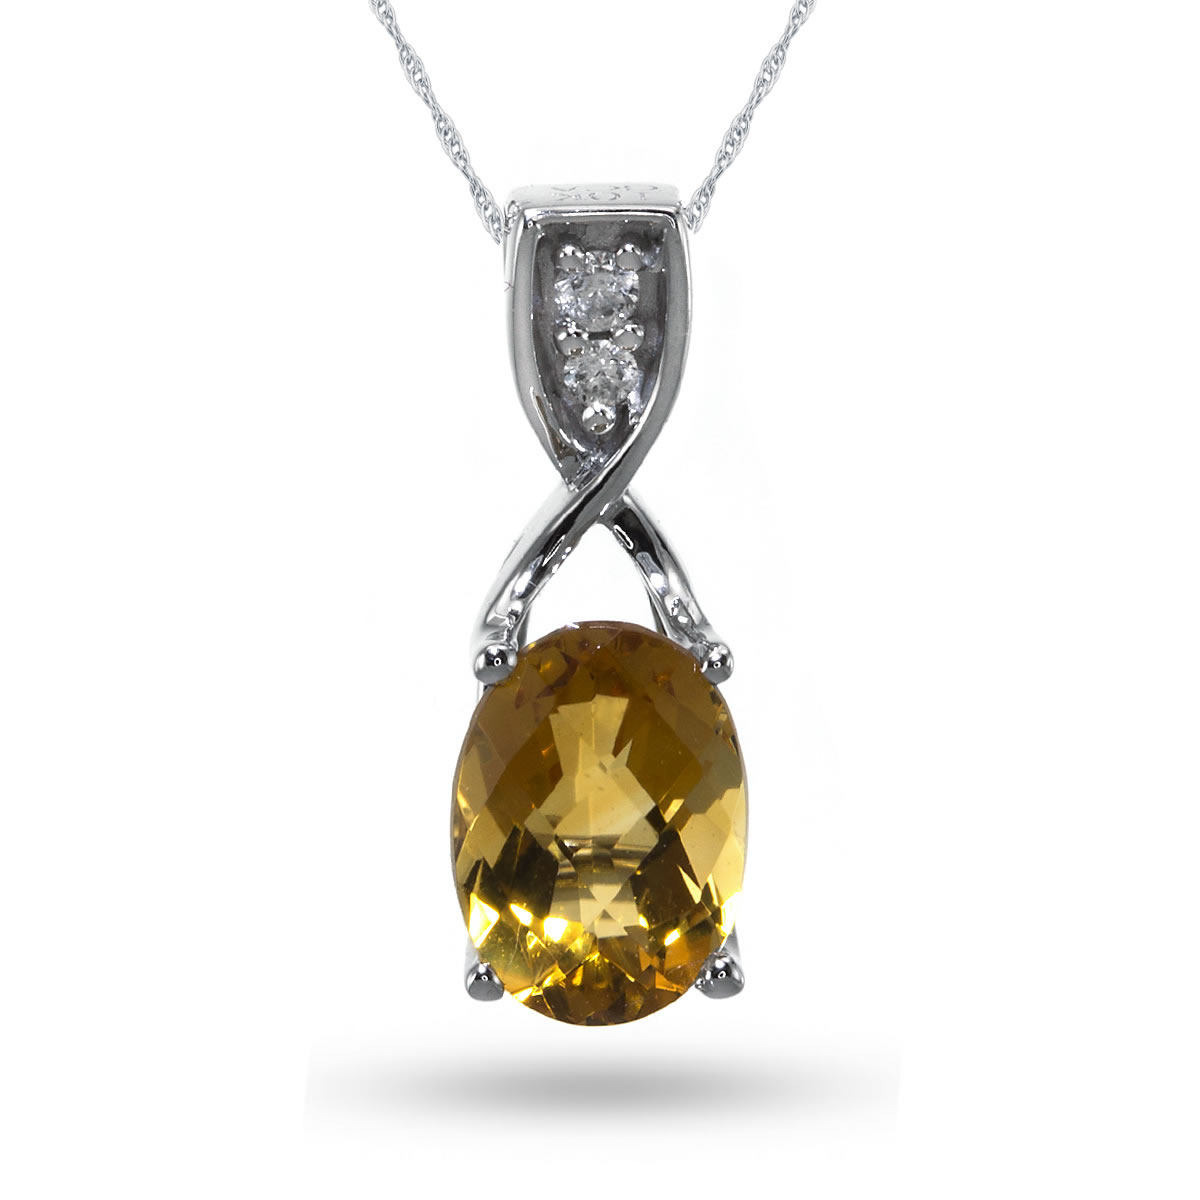 10K White Gold Oval Citrine and Diamond Pendant